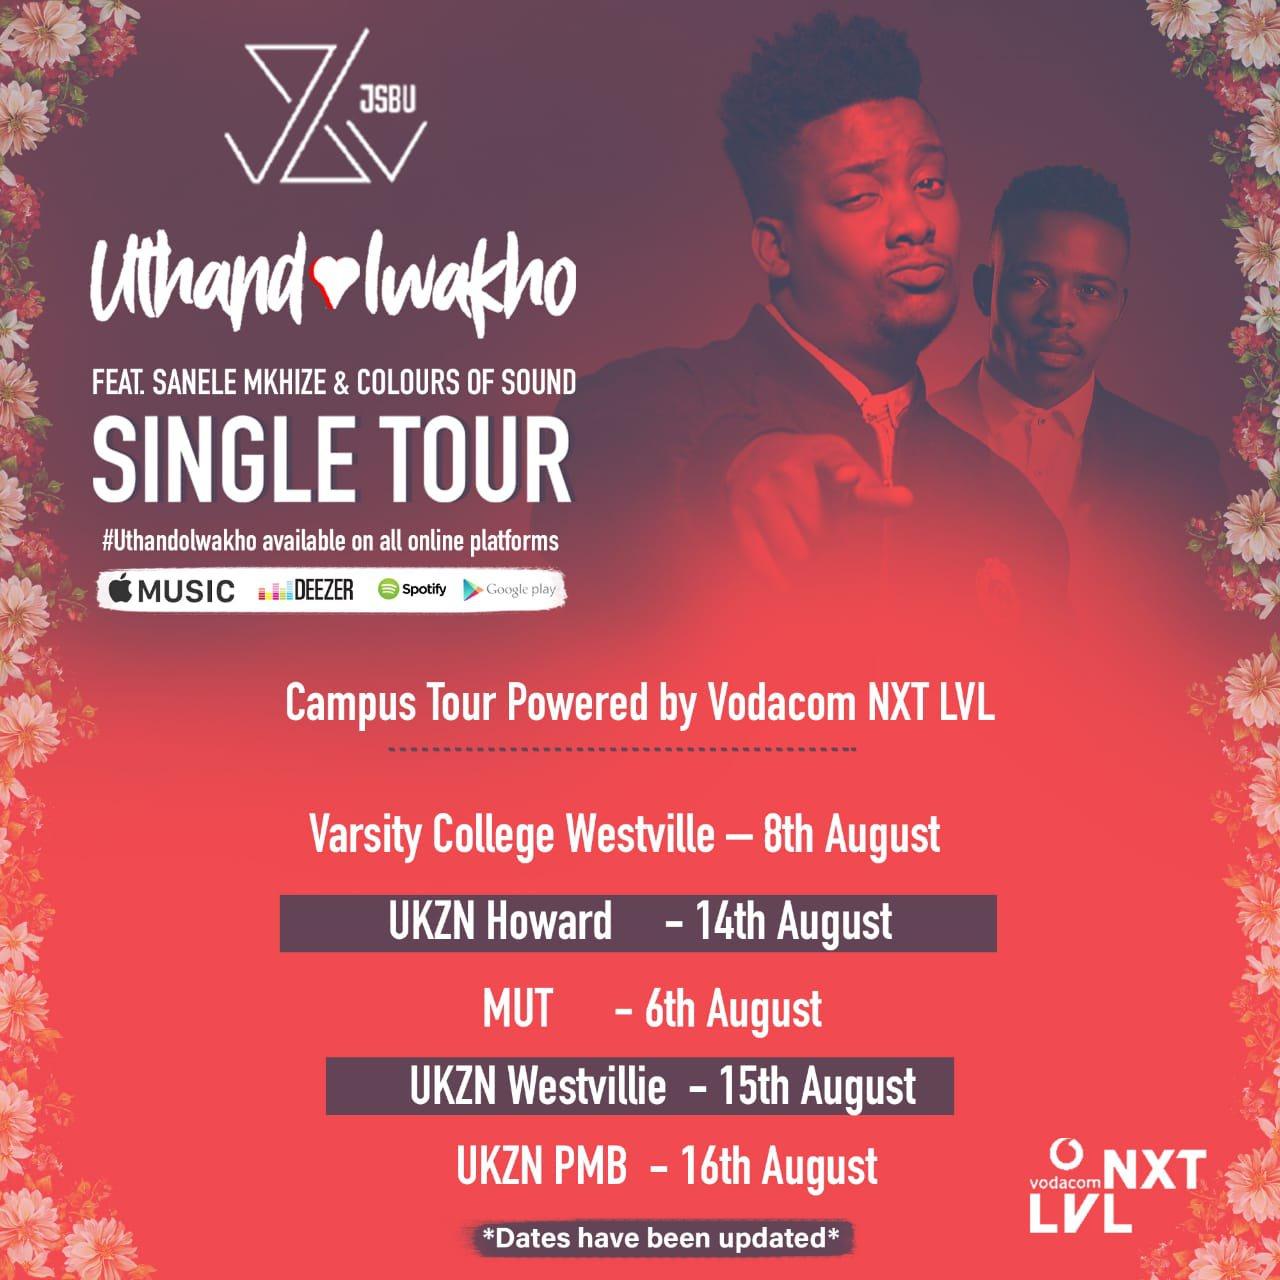 jsbu tour dates